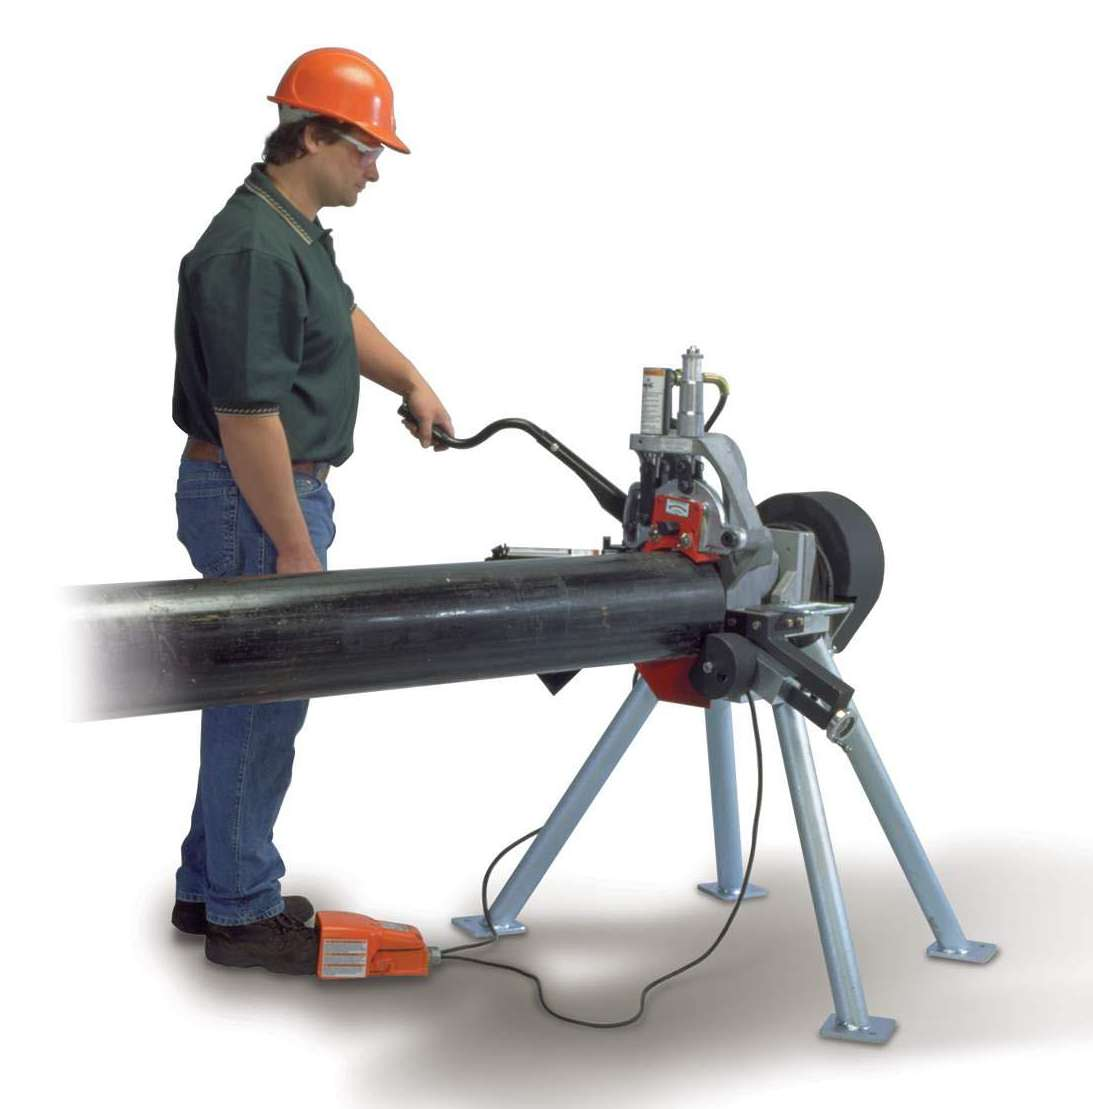 victaulic groover machine